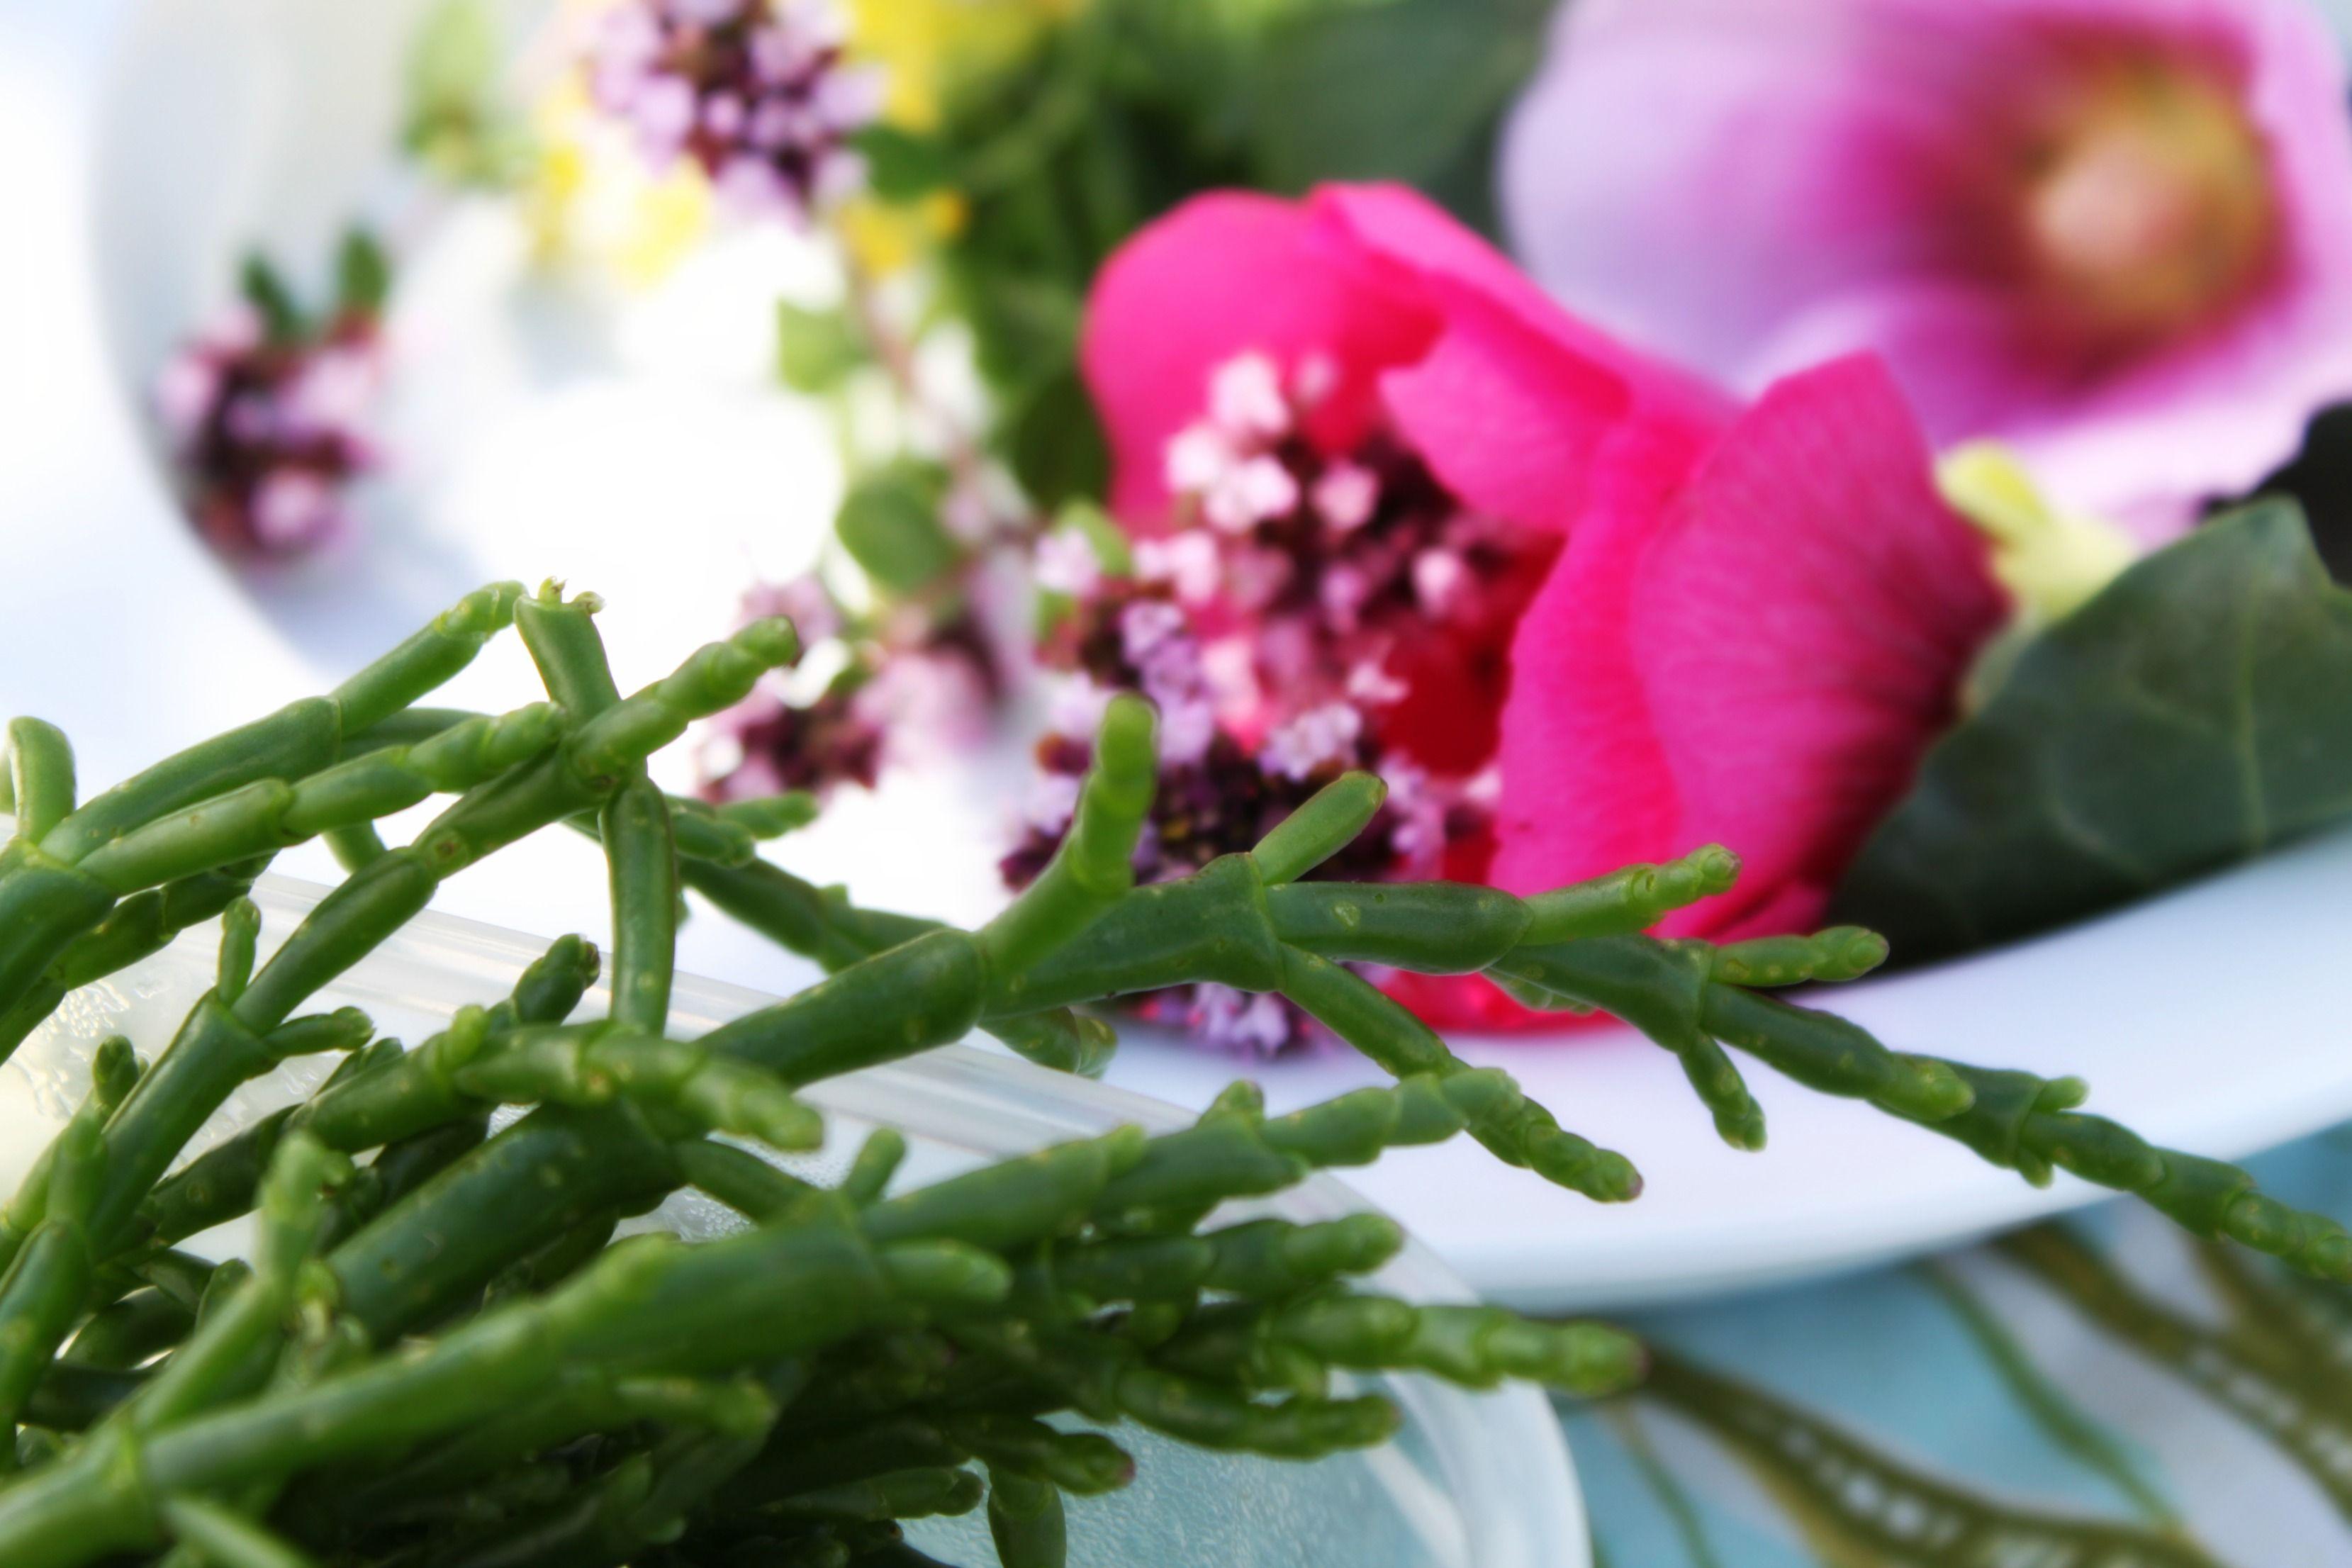 #Saveurs #Salicorne #Fleurs #Nature #RochefortOcean Charente Maritime Poitou Charentes